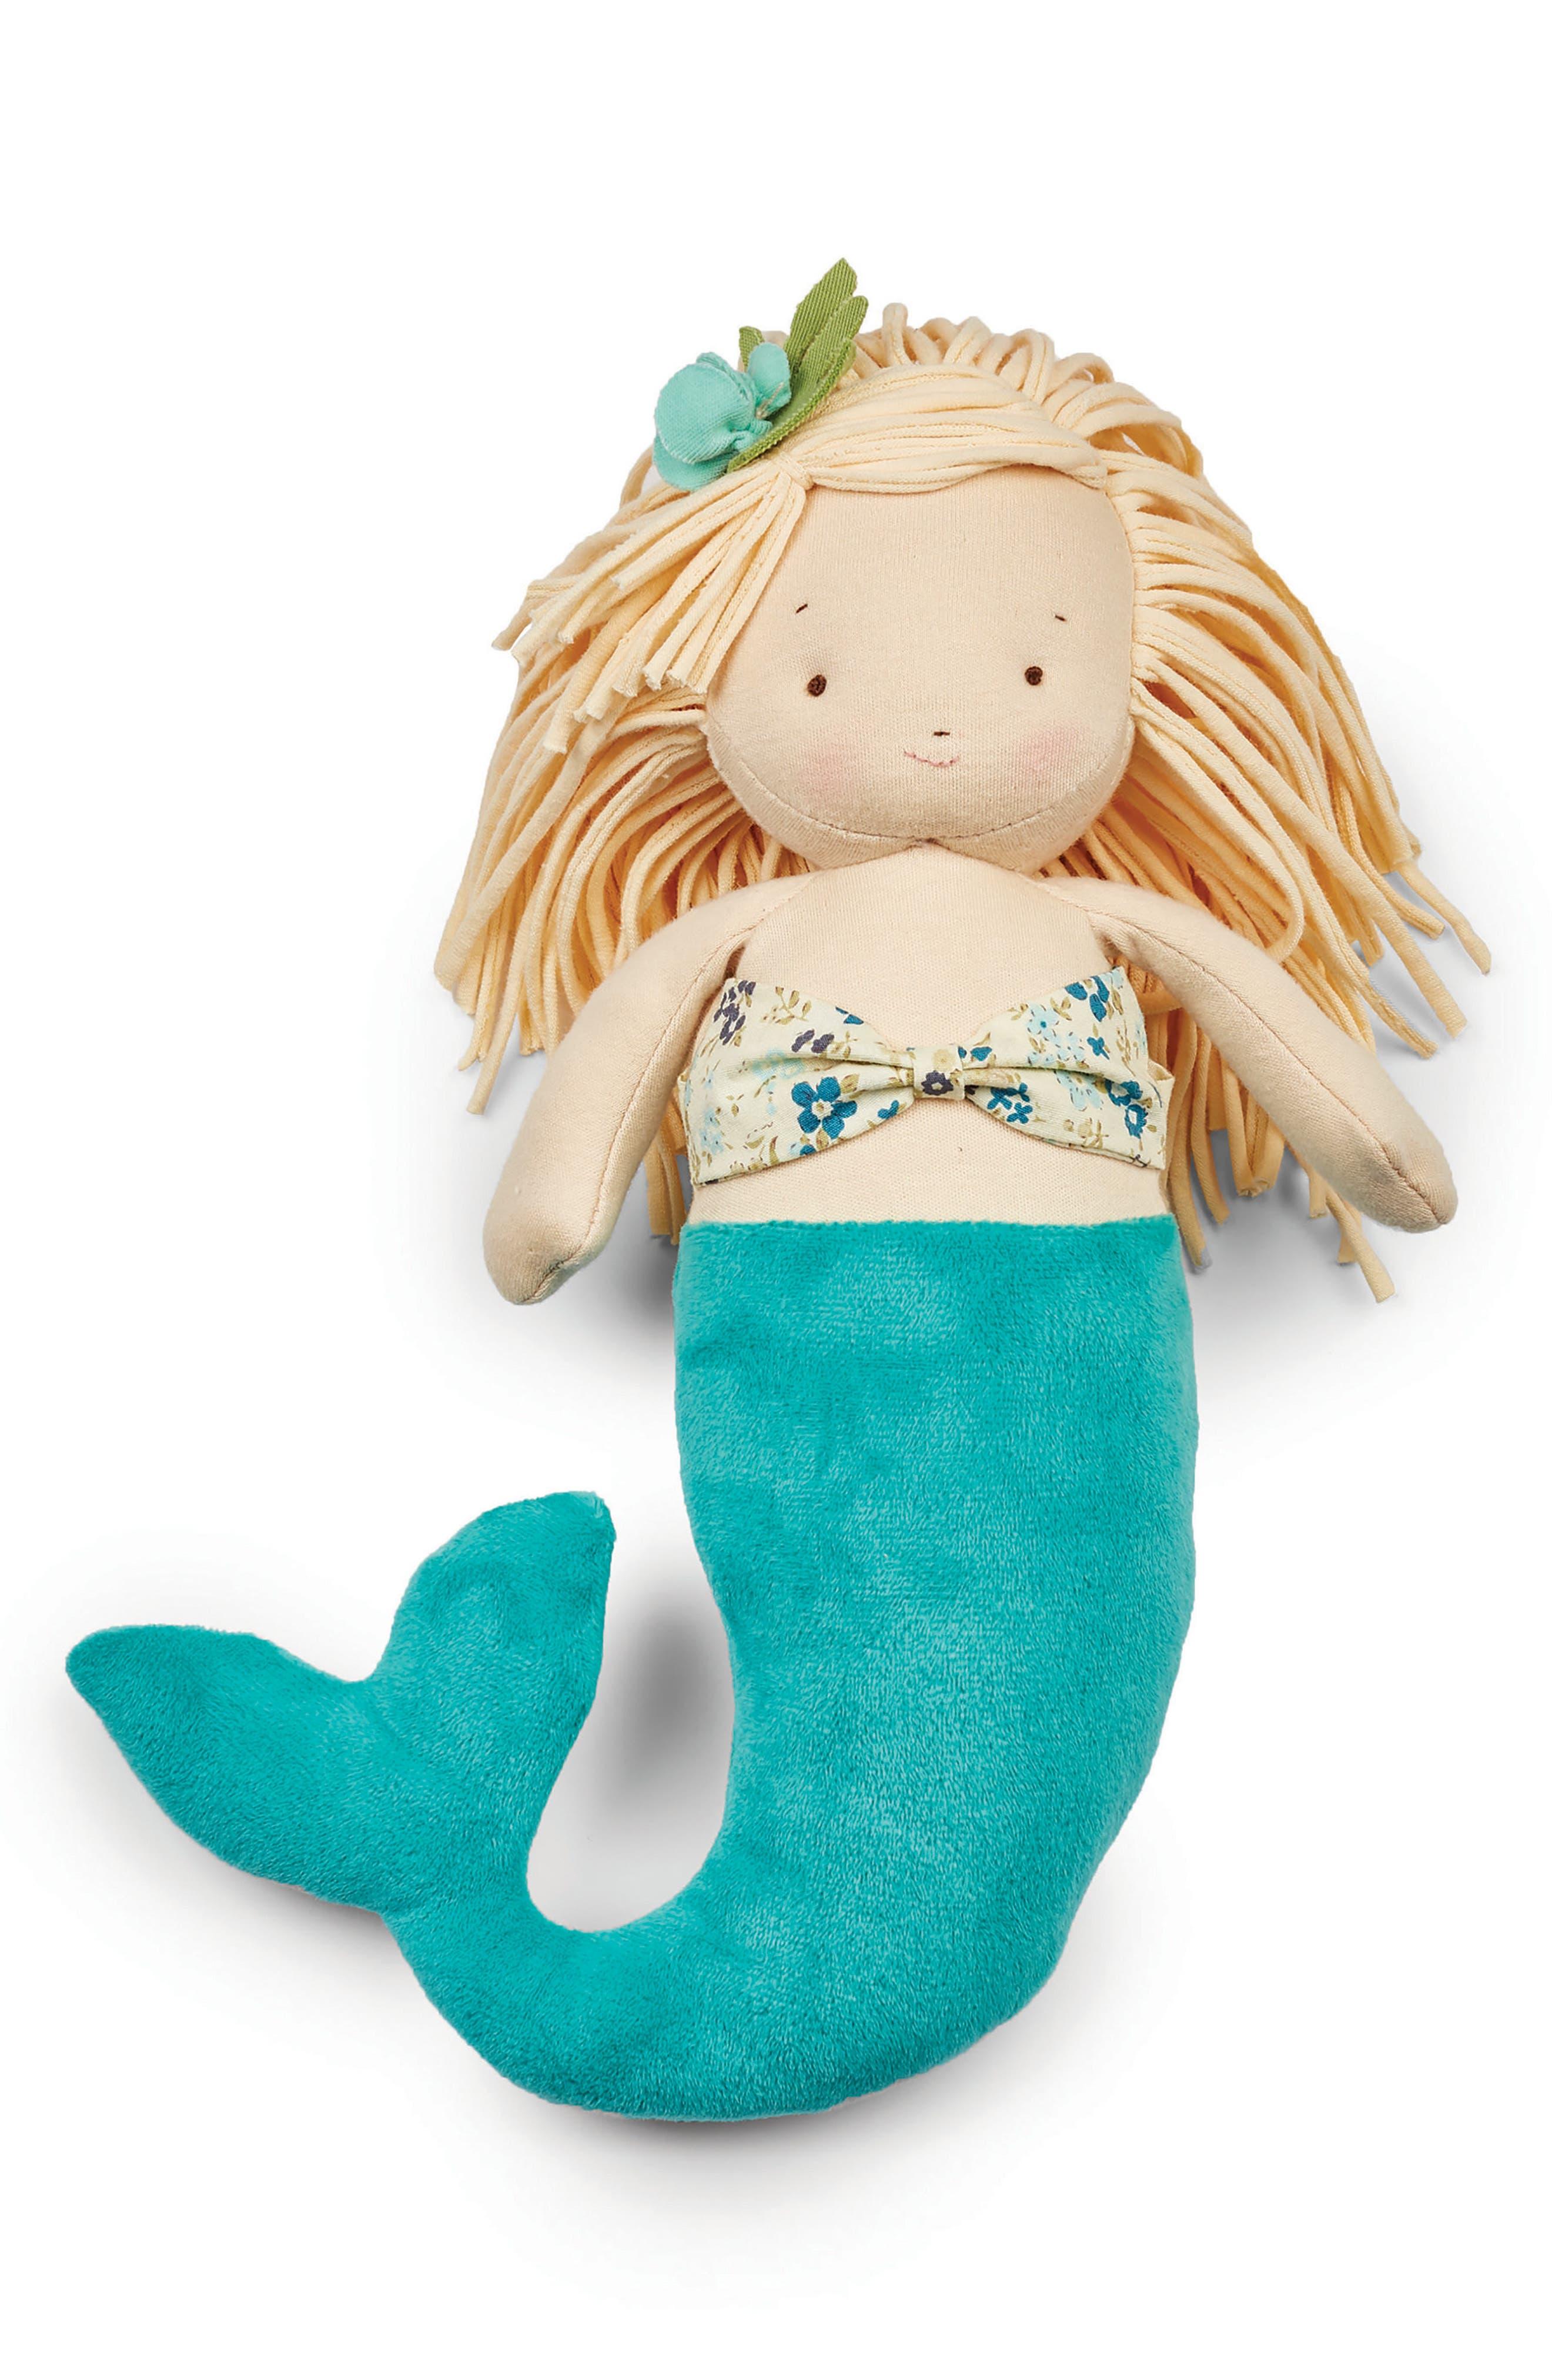 El-Sea Mermaid Doll,                         Main,                         color, Beige